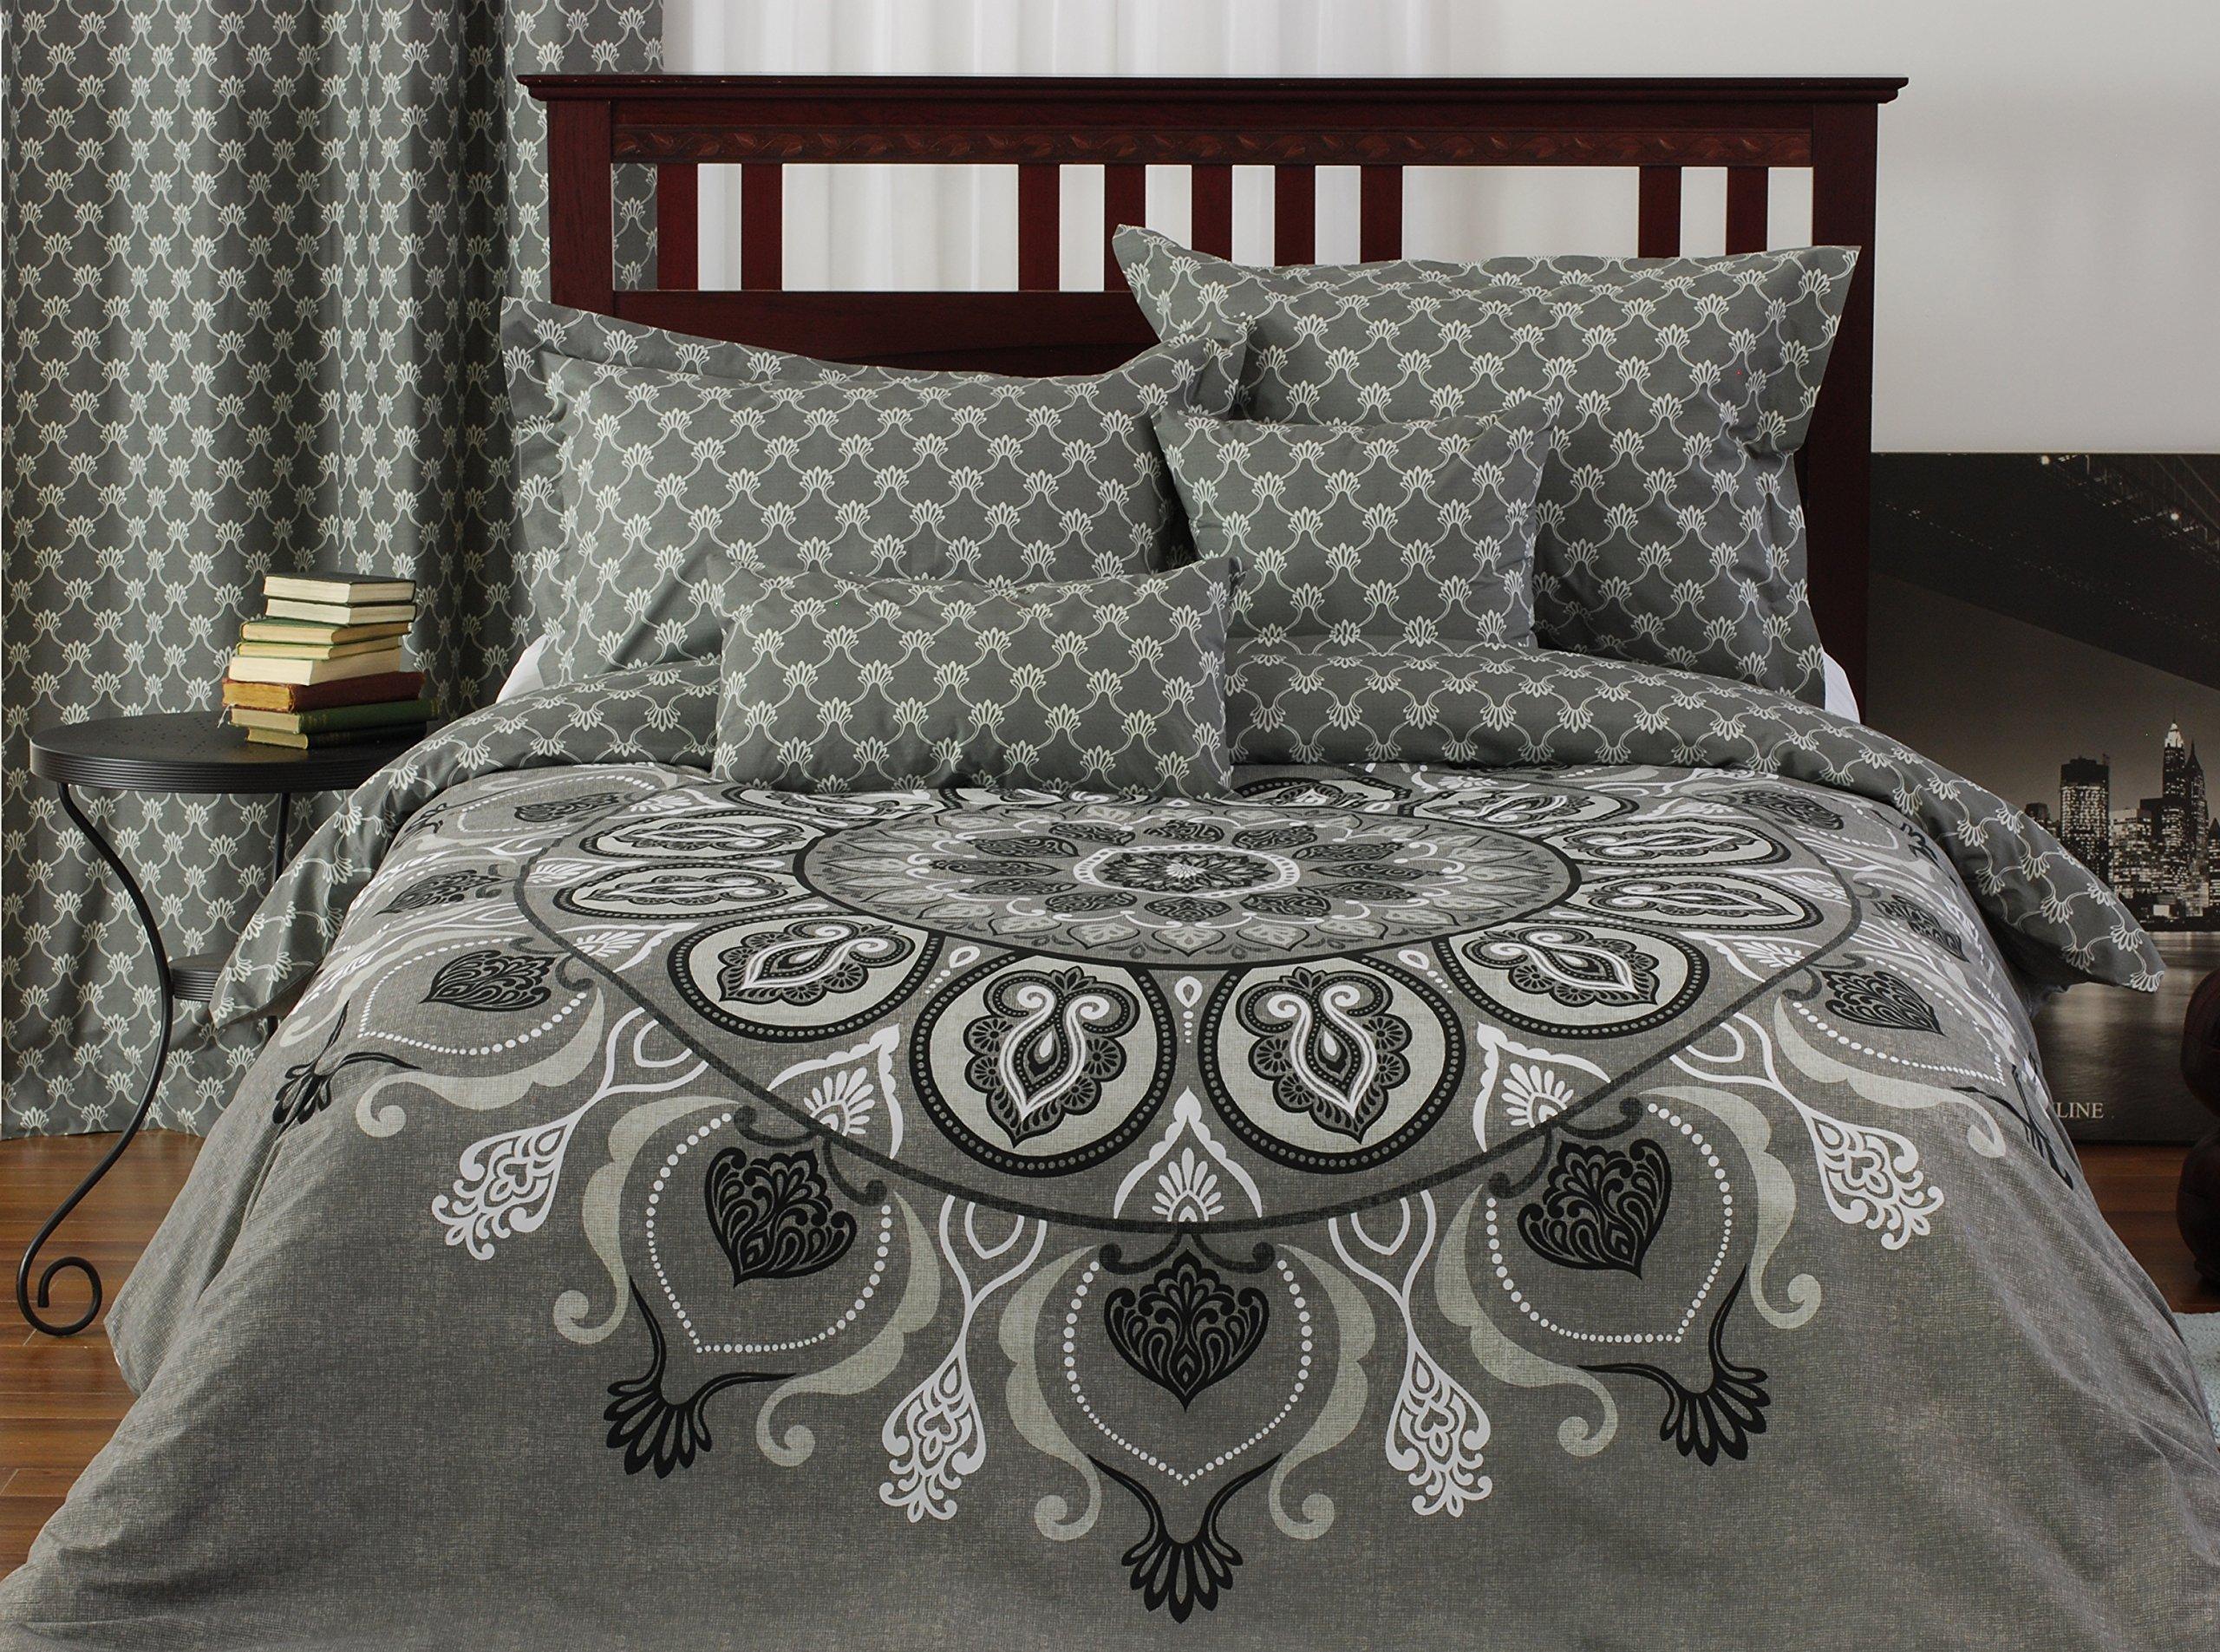 Viceroy 5-piece reversible Duvet Cover Set, King, medallion, Moroccan tile, greys, onyx, white